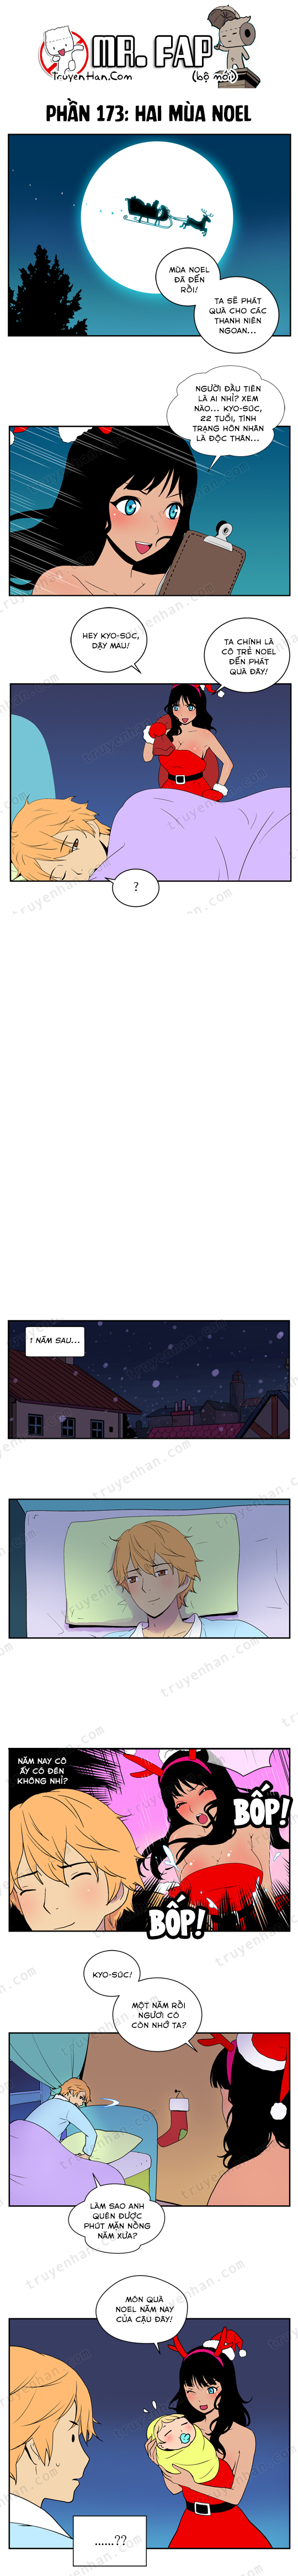 Mr. FAP (bộ mới) phần 173: Hai mùa Noel